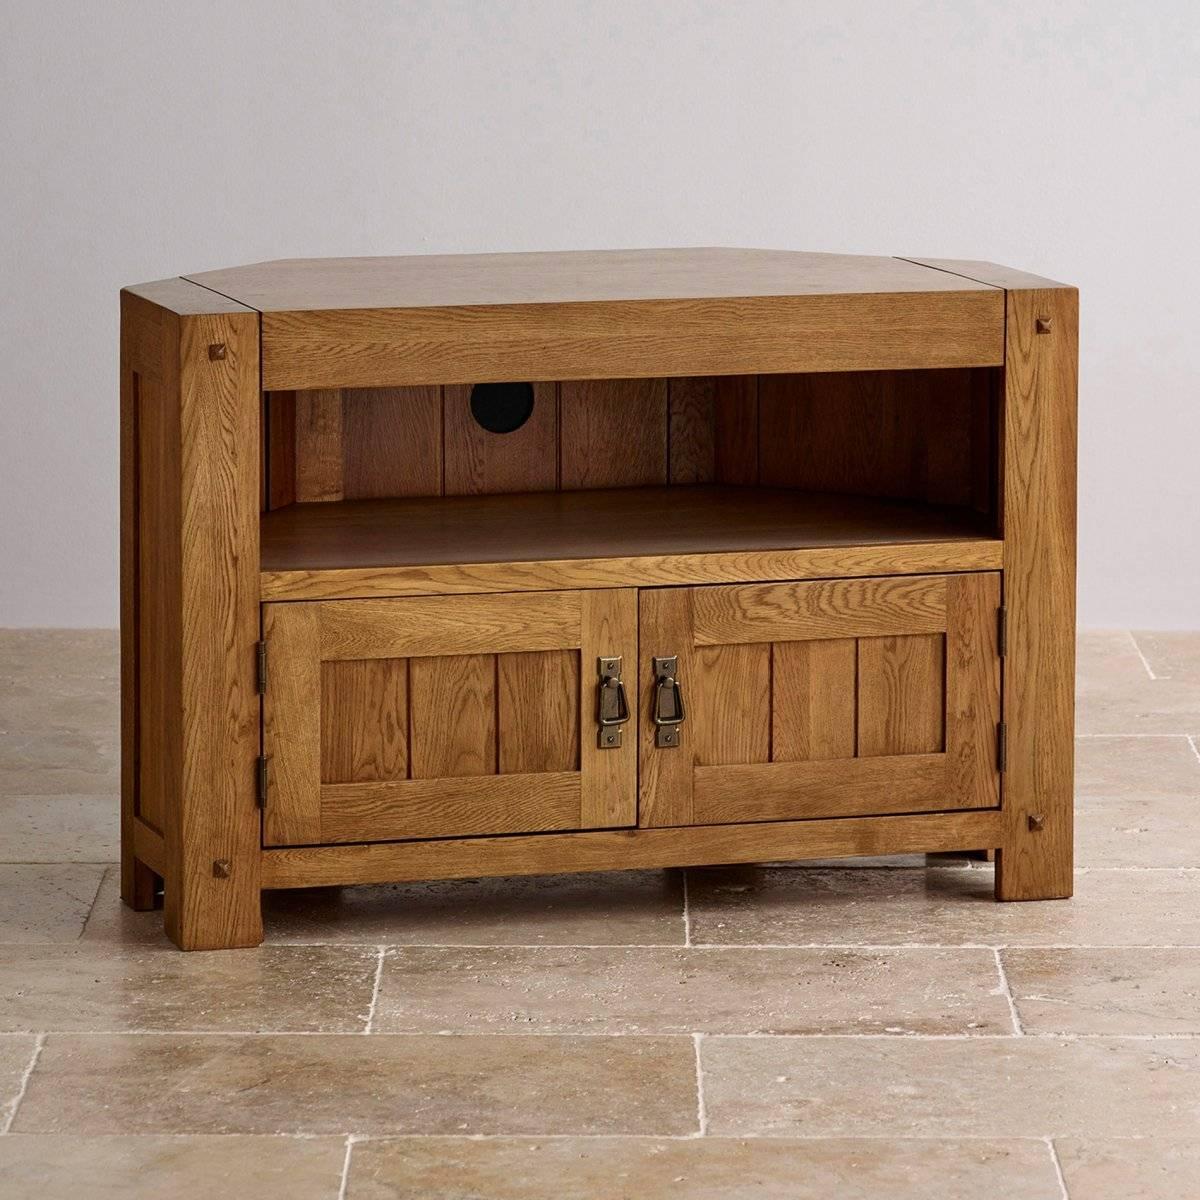 Quercus Corner Tv Cabinet In Rustic Oak | Oak Furniture Land Intended For Corner Oak Tv Stands (View 9 of 15)